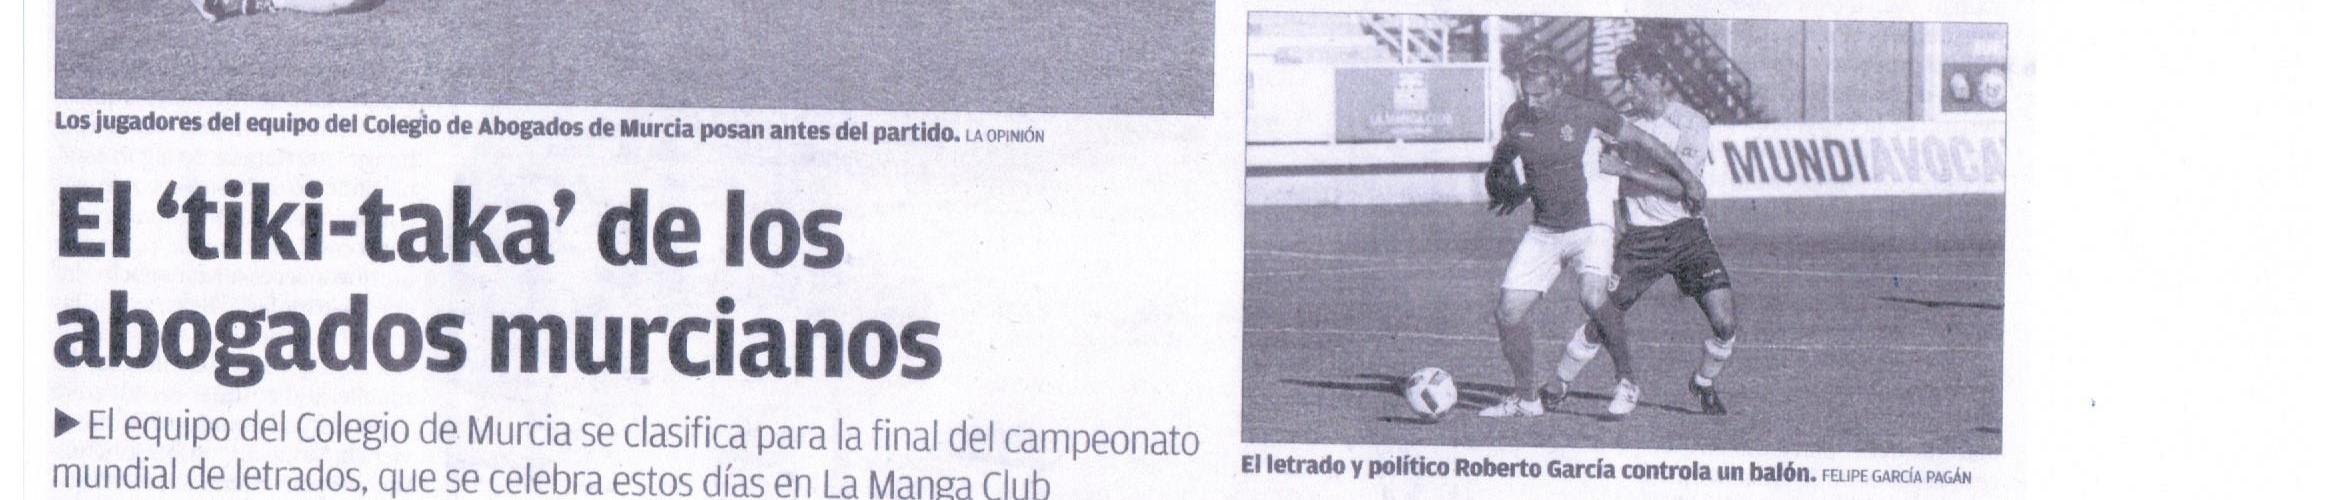 Tarso Fisioterapia, Colegio Abogados Murcia, Ganadores Mundial Fútbol